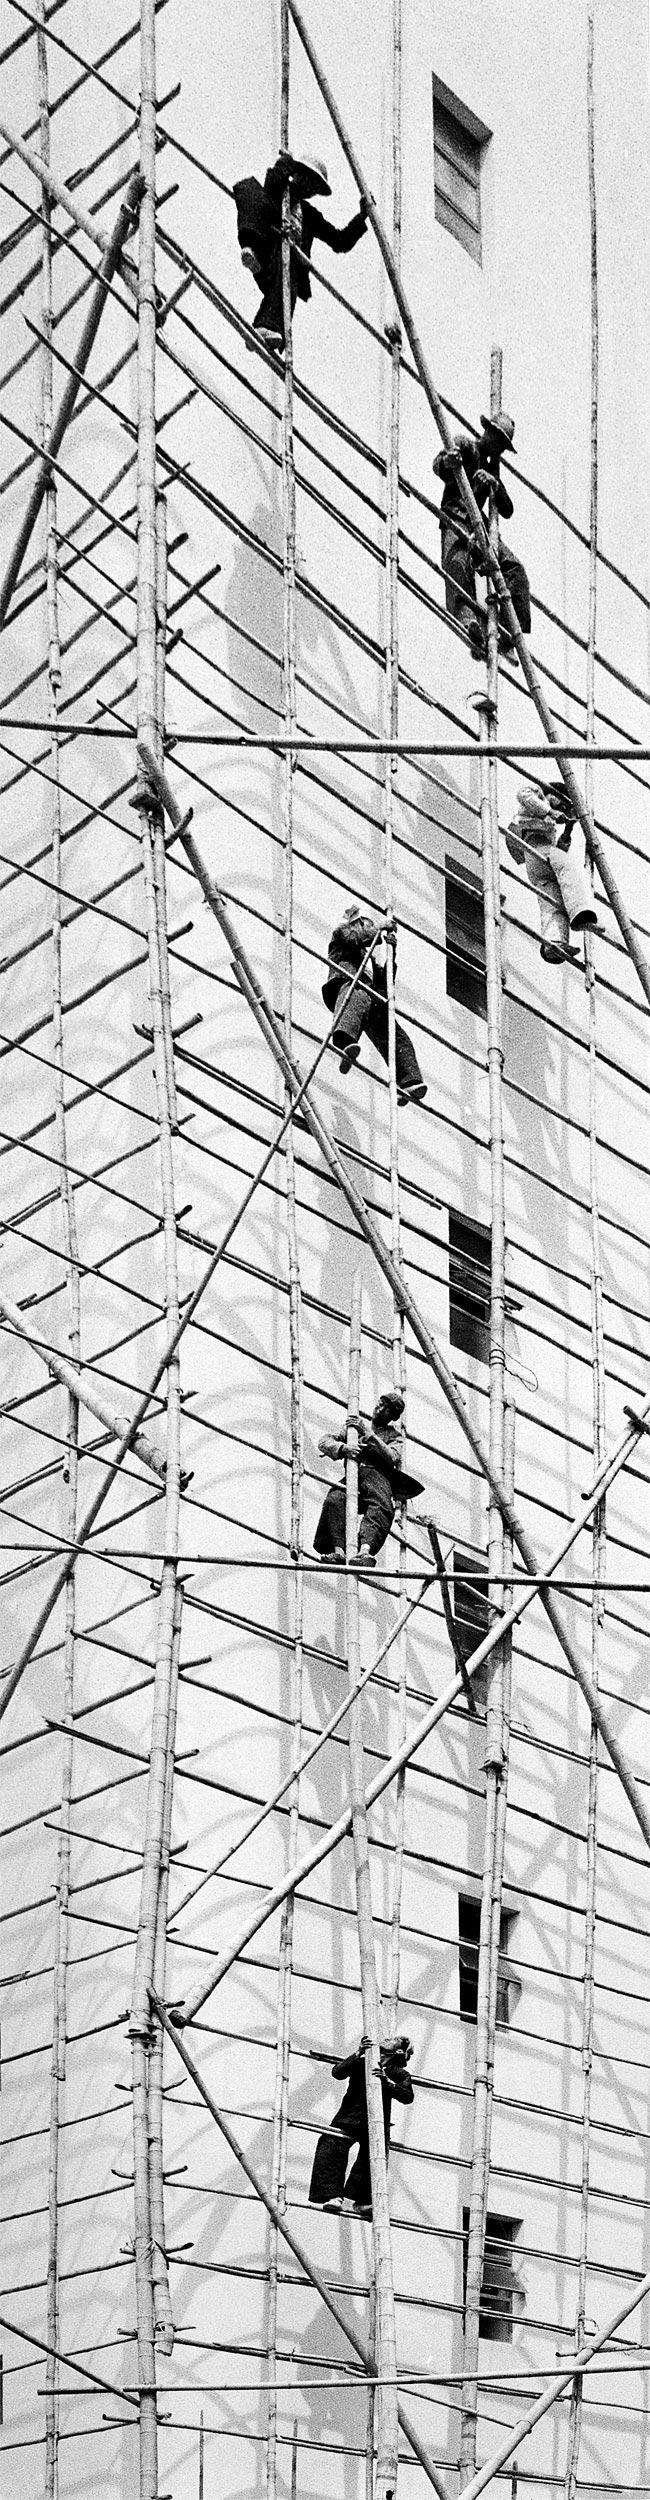 hong kong retro street photography urban